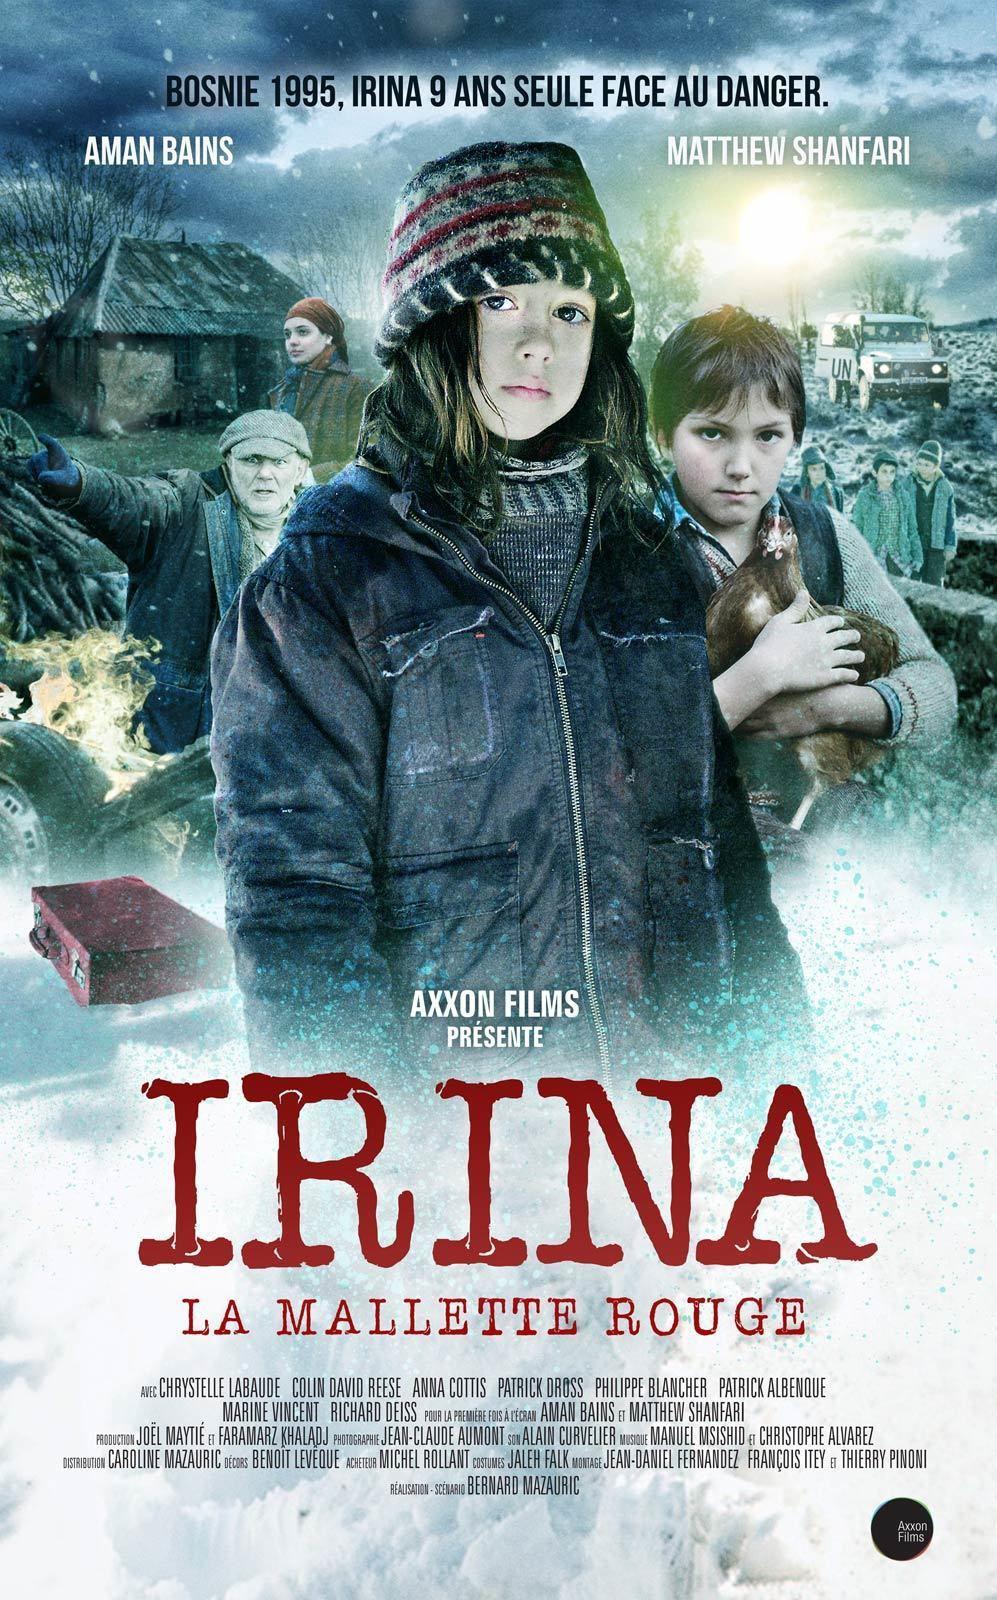 Irina, la mallette rouge - Film (2008)